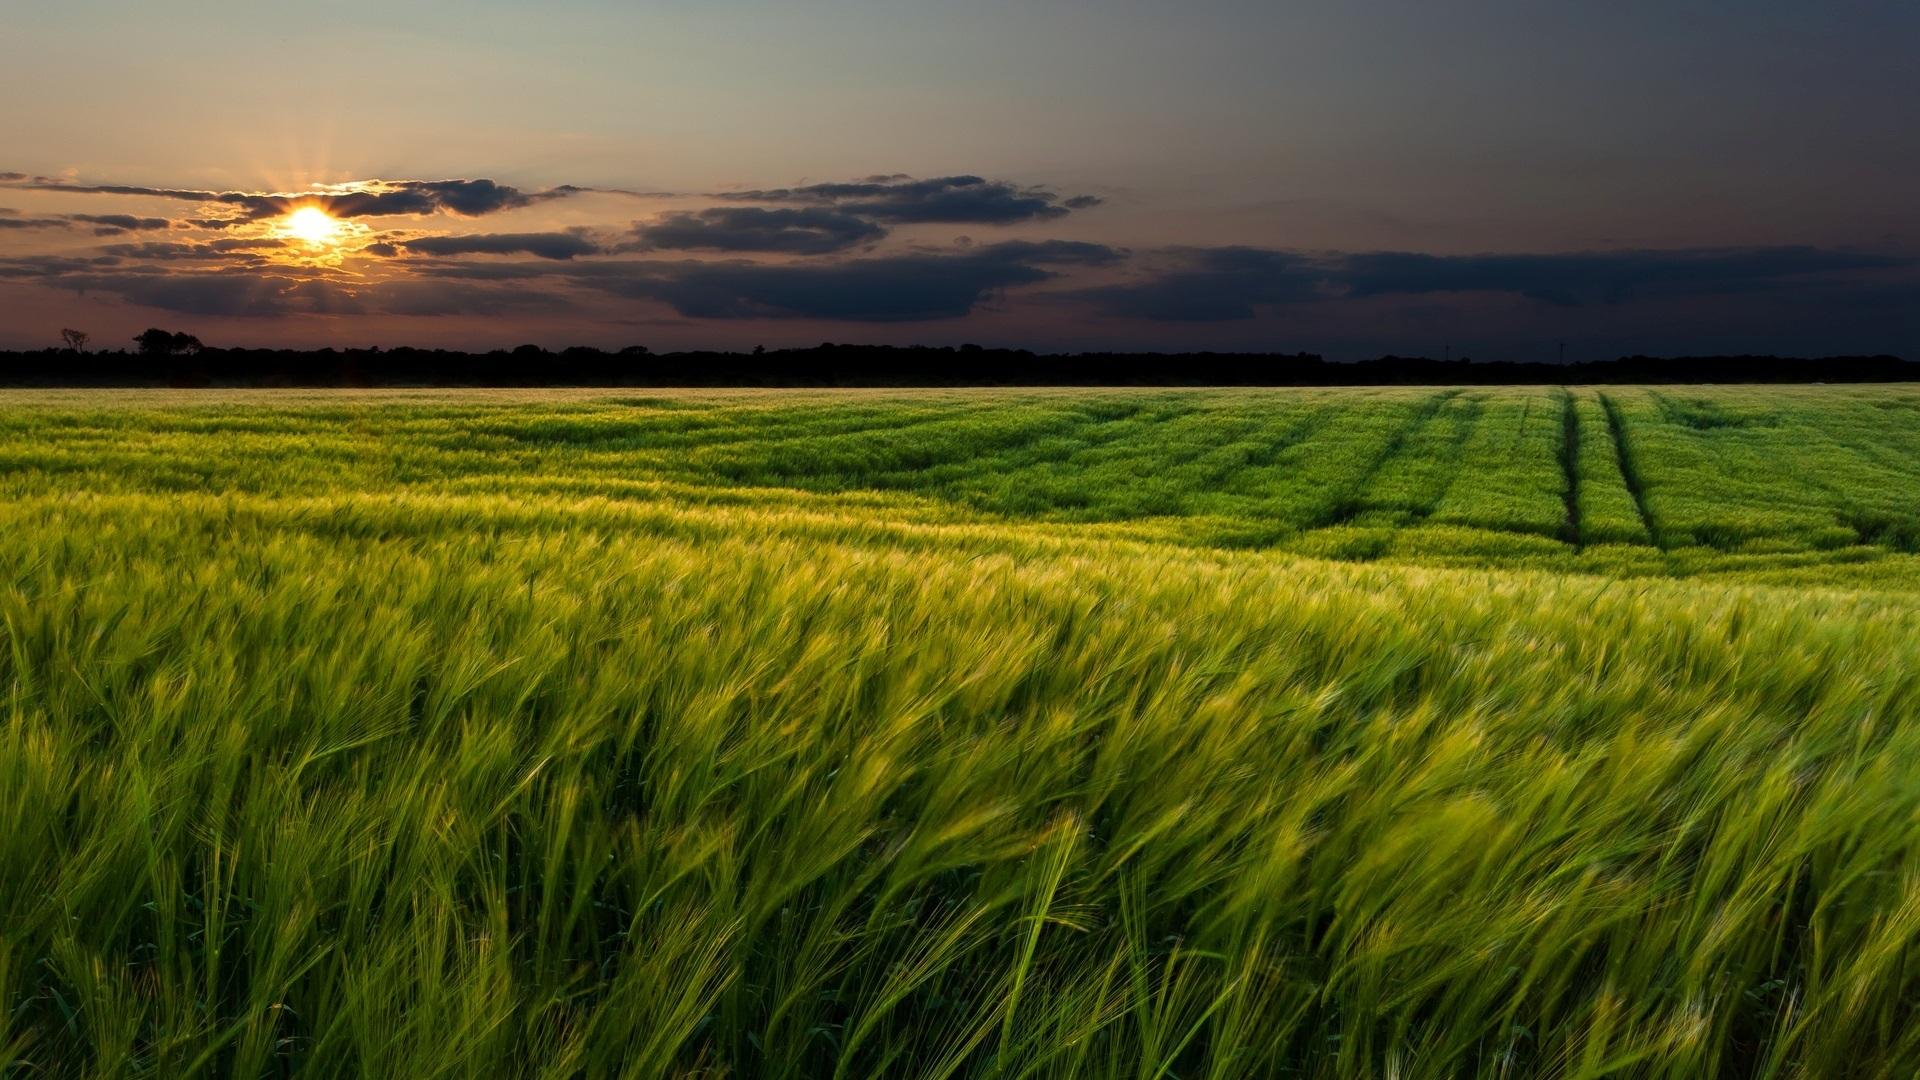 природа трава поле на телефон